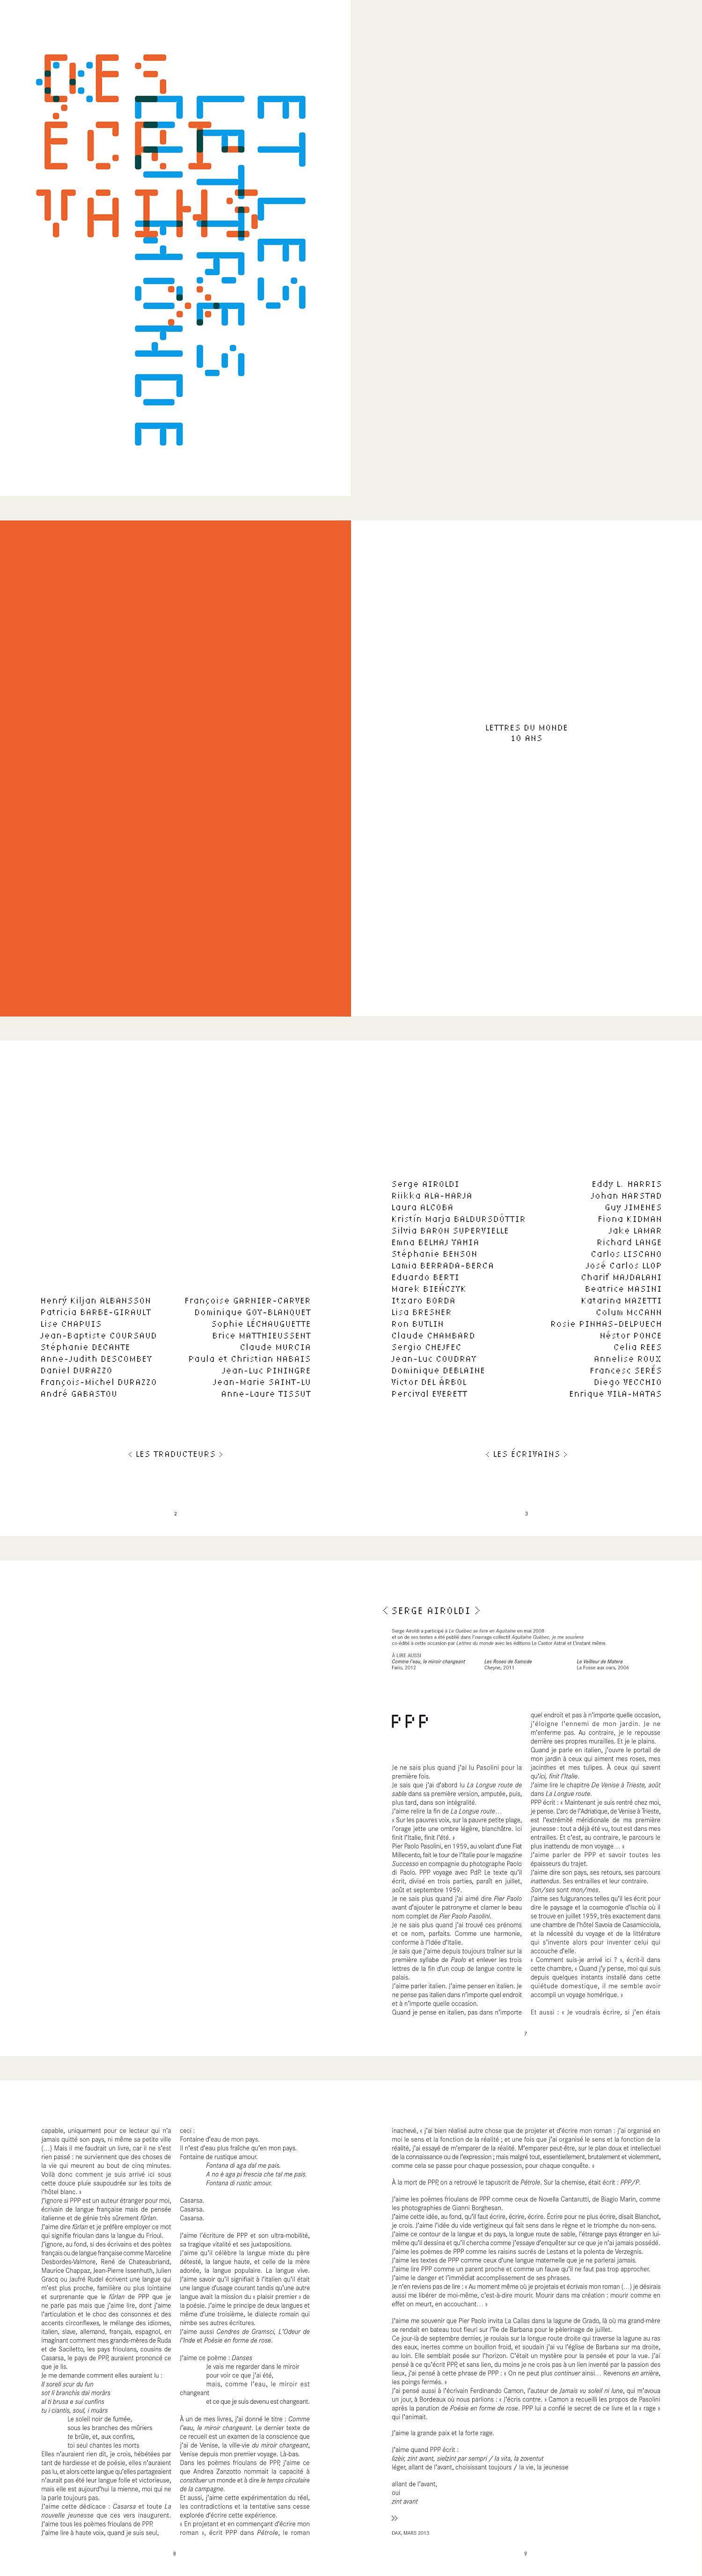 MrThornill-graphisme-lettres-du-monde-10eme-edition-2013-ph2